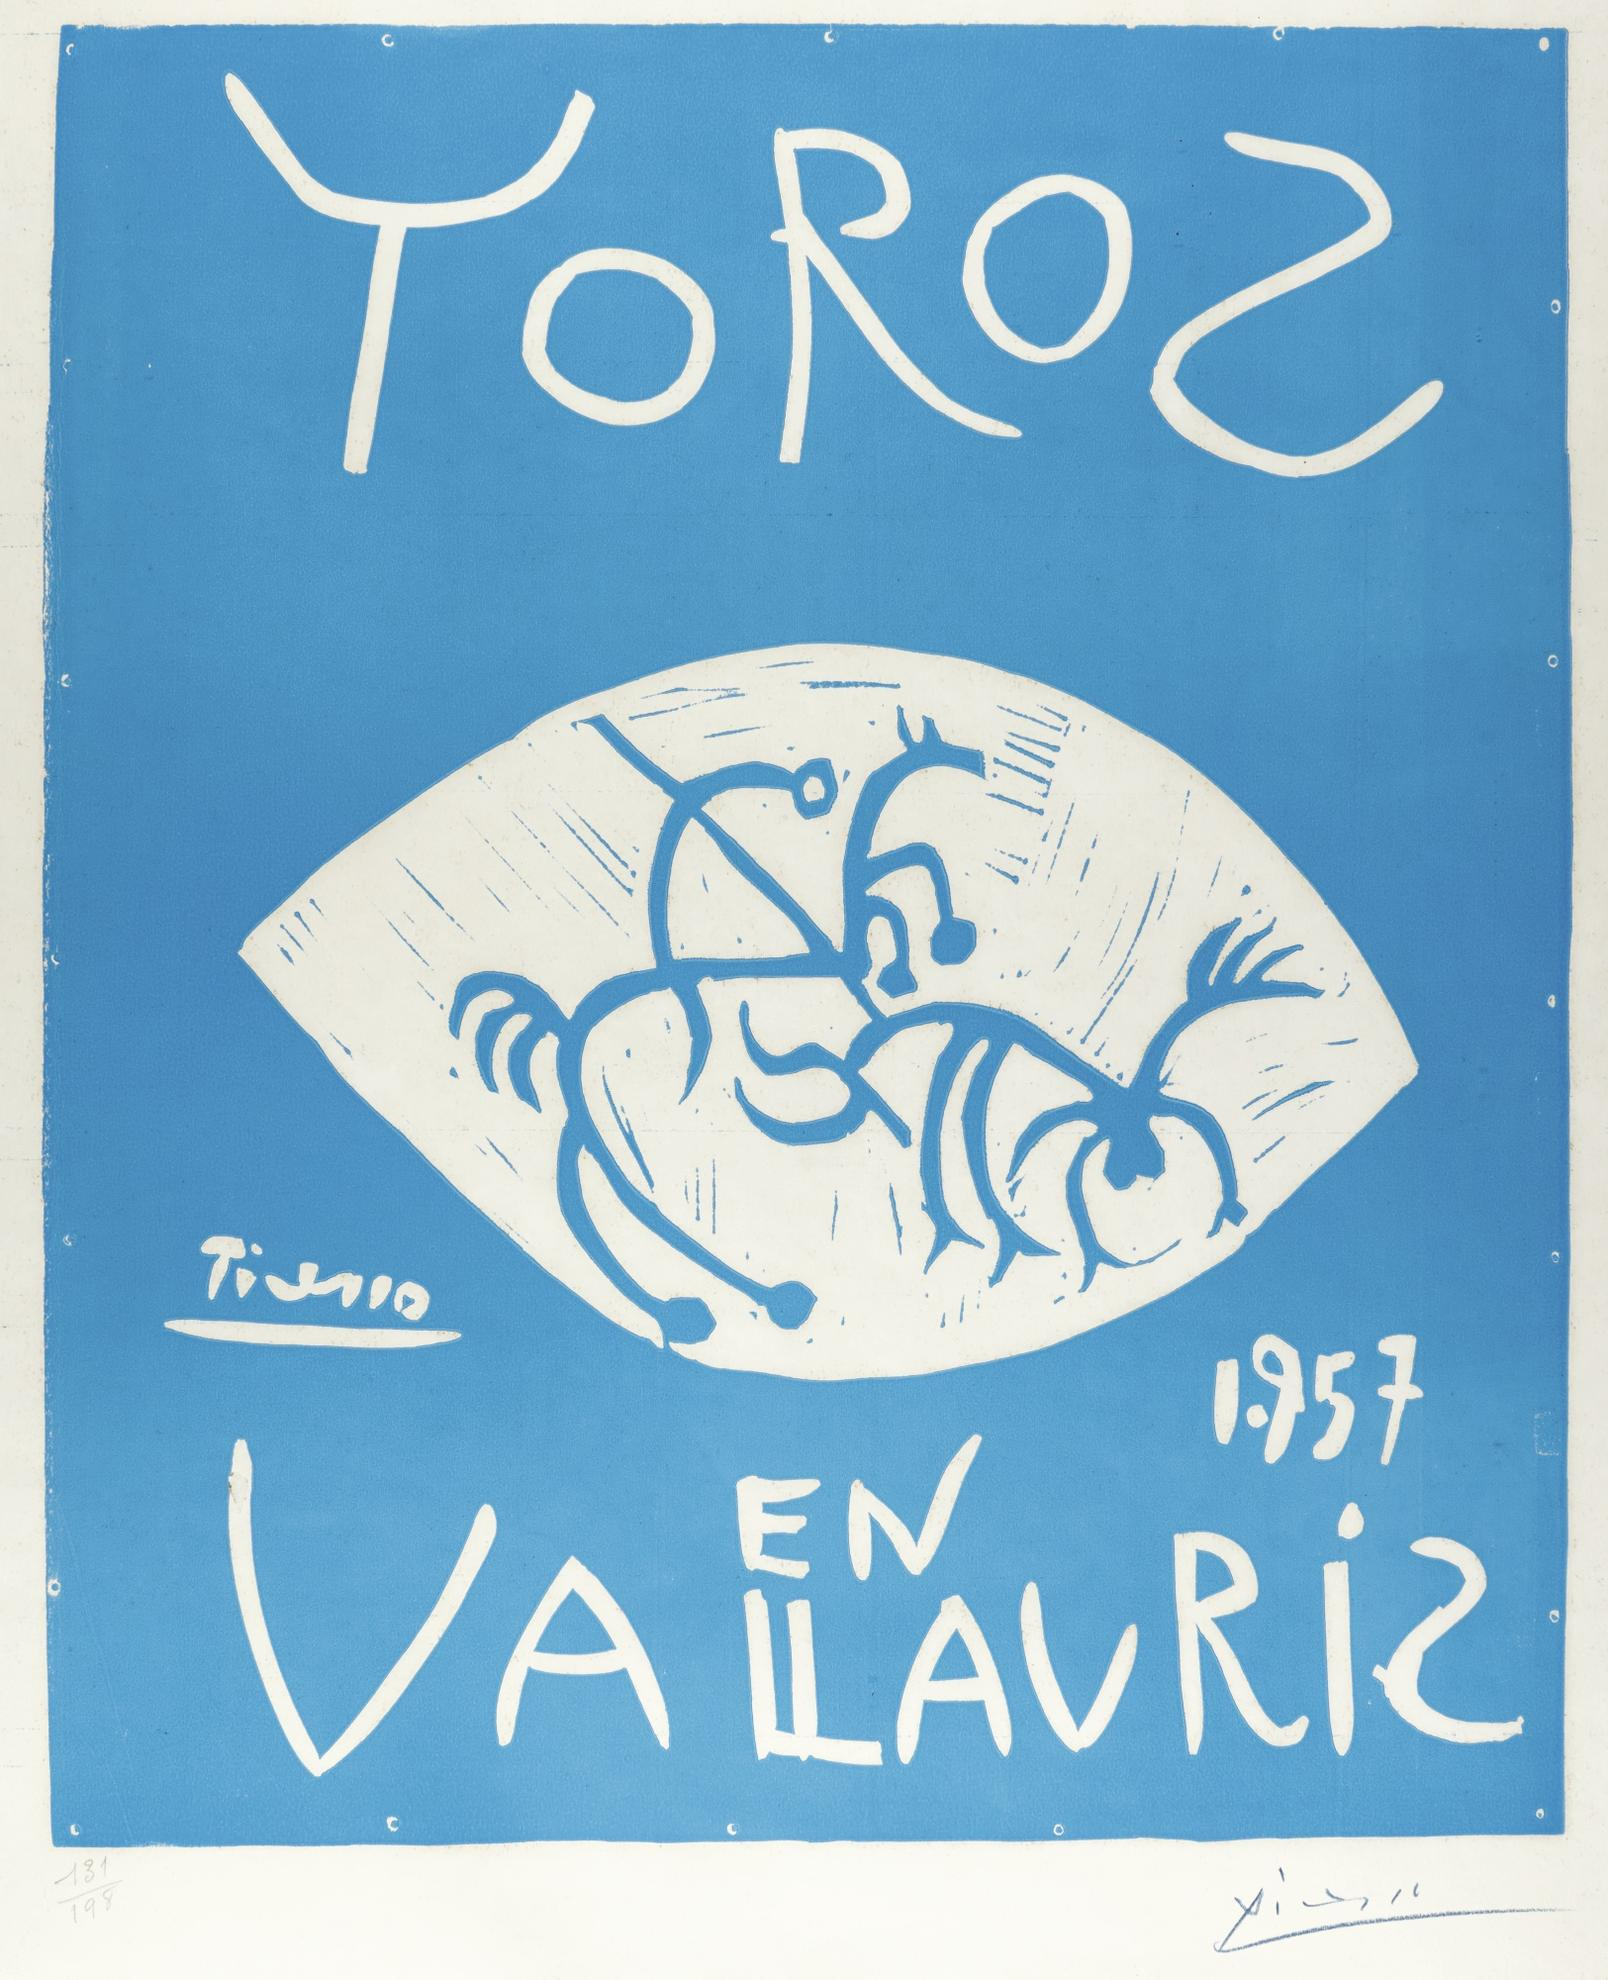 Pablo Picasso-Toros En Vallauris 1957 (B. 1276; Ba. 1045; Pp. L-024; Czwiklitzer 23)-1957